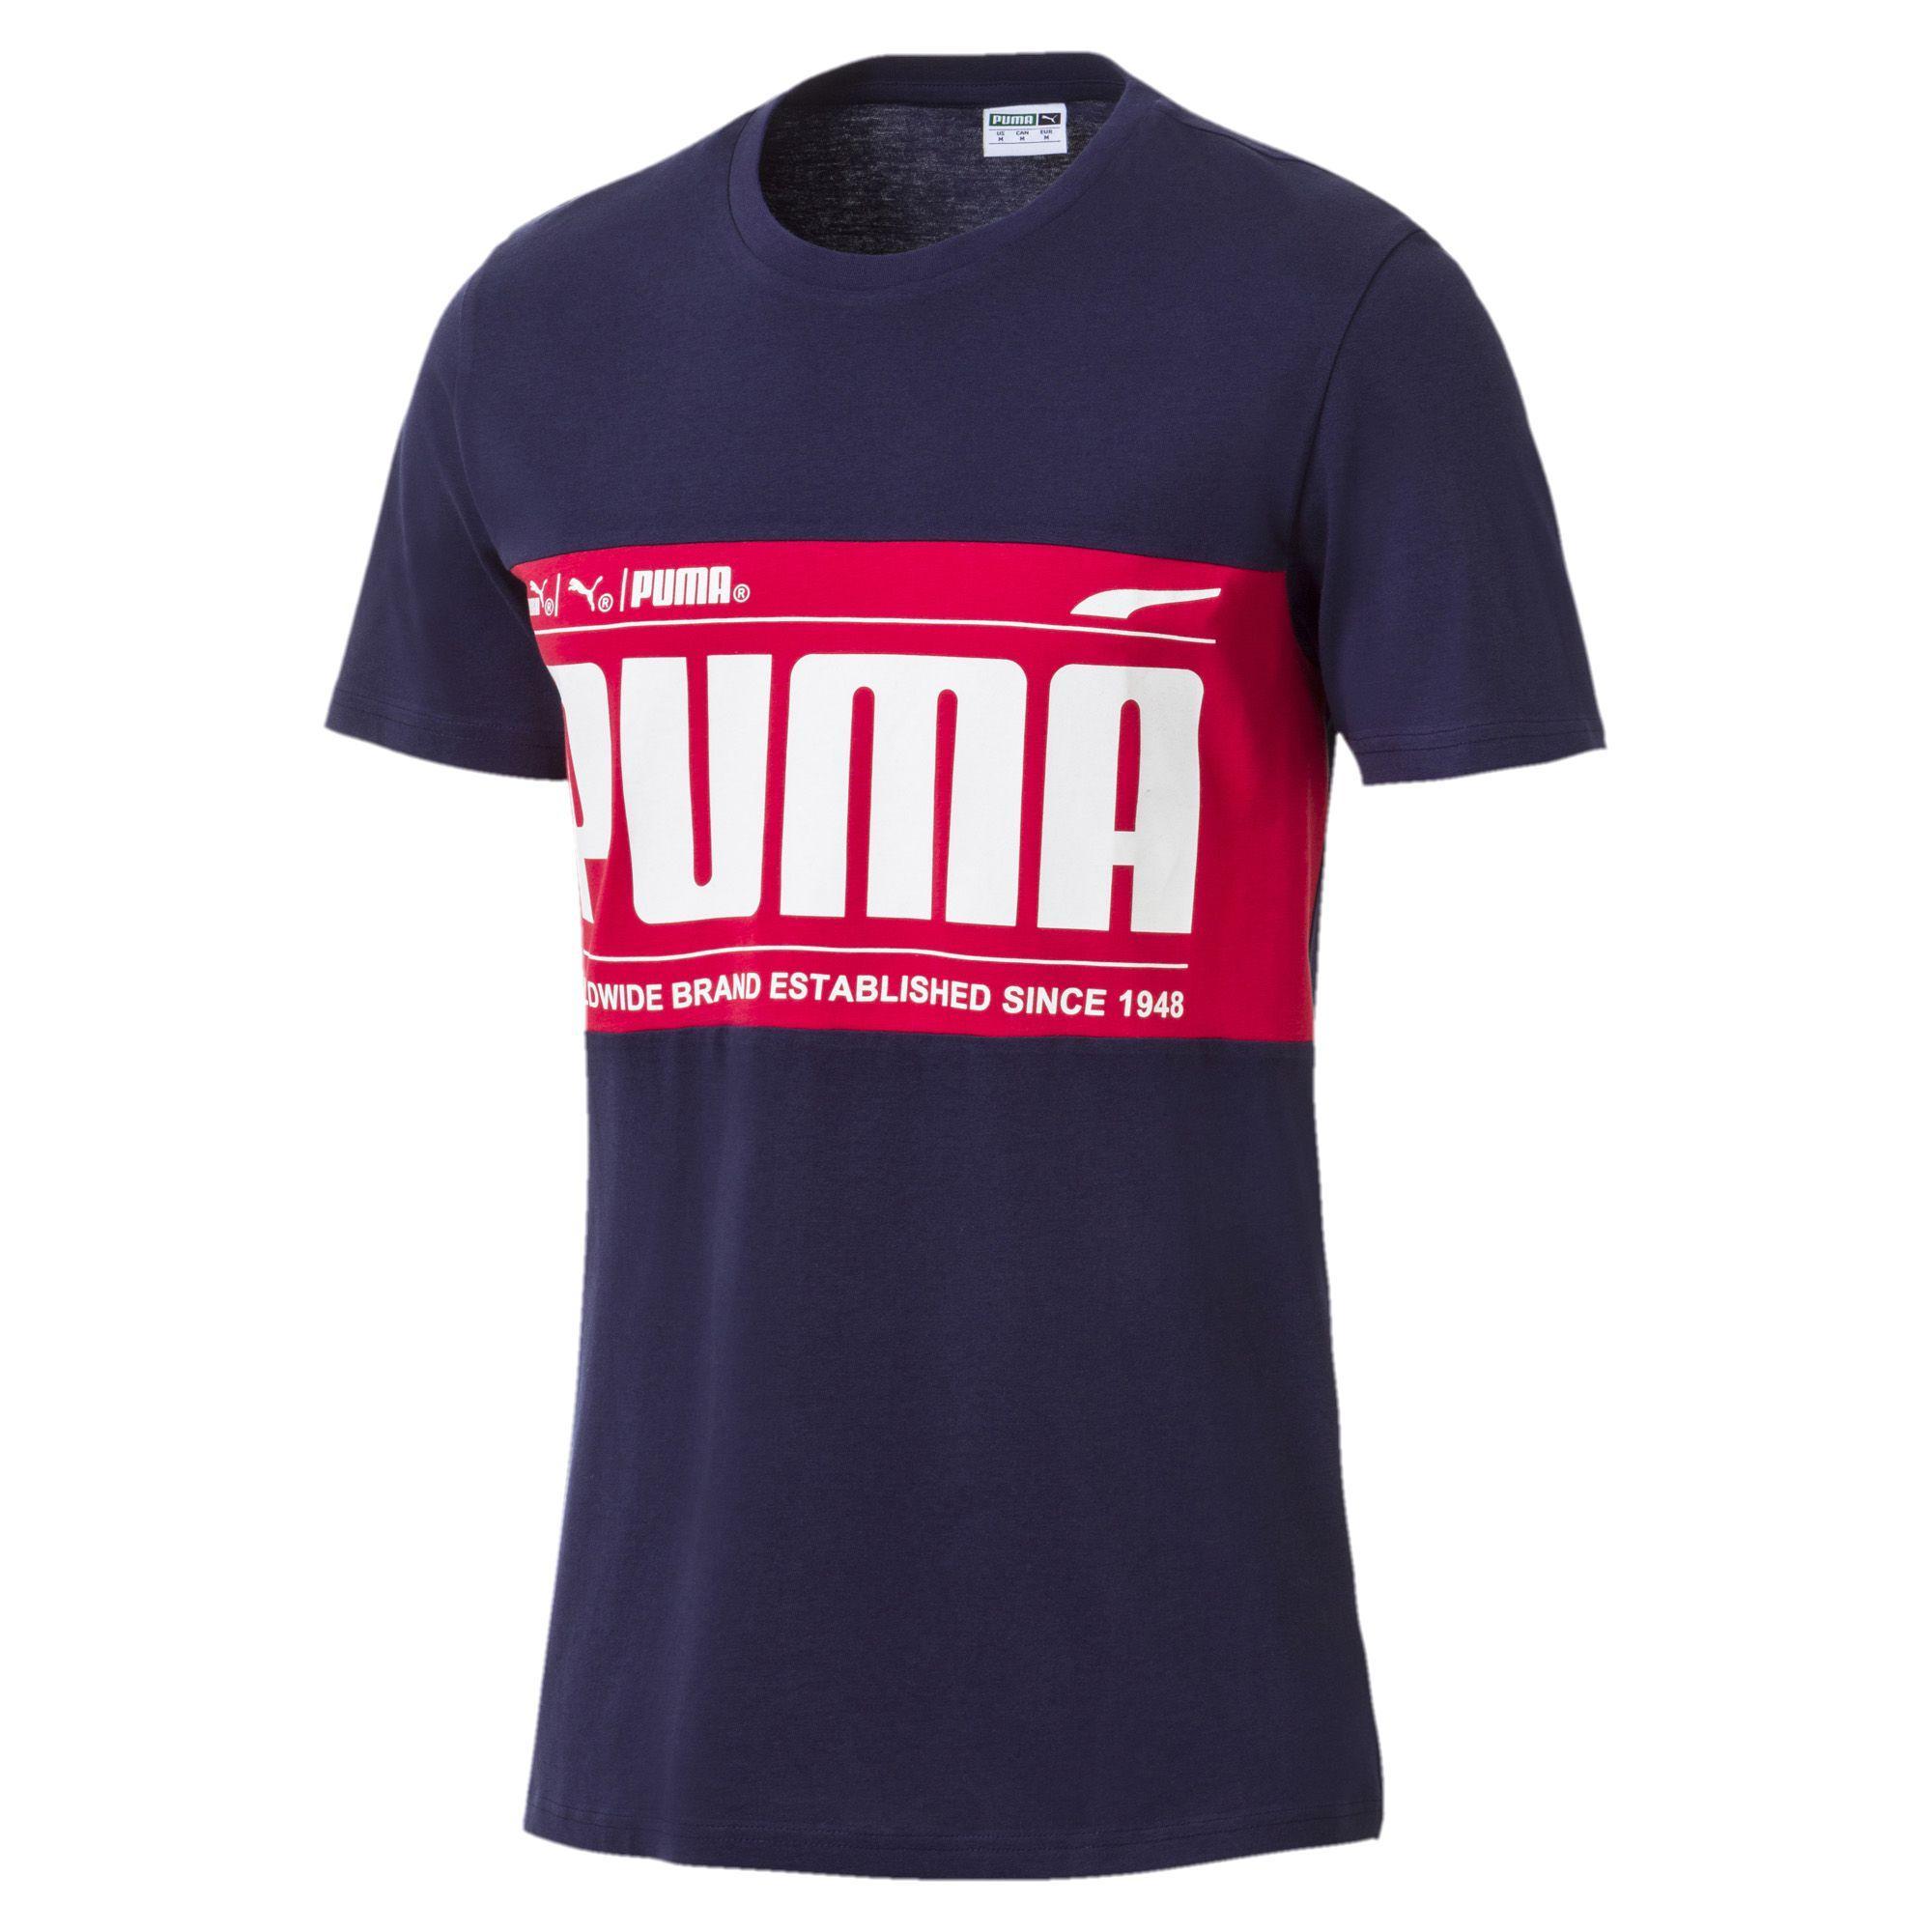 Puma T-shirt Graphic Logo Block